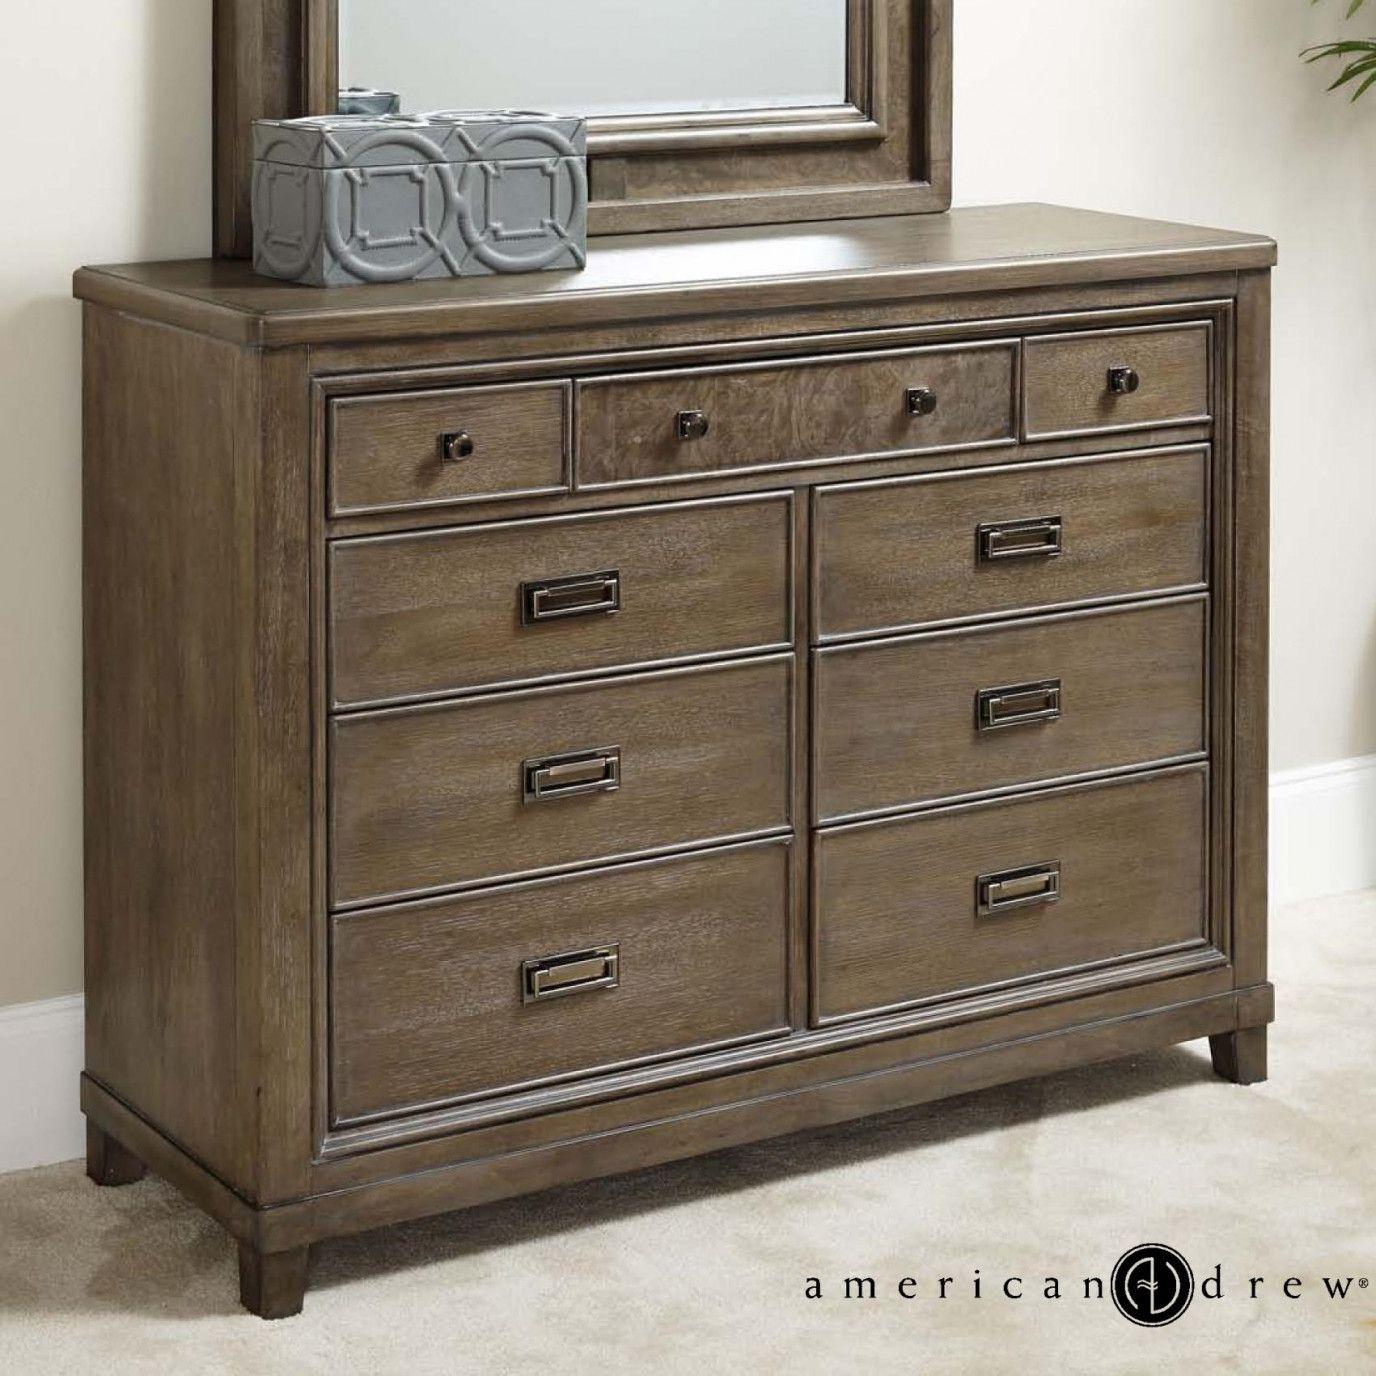 78+ Dresser with Media Storage Interior Design for